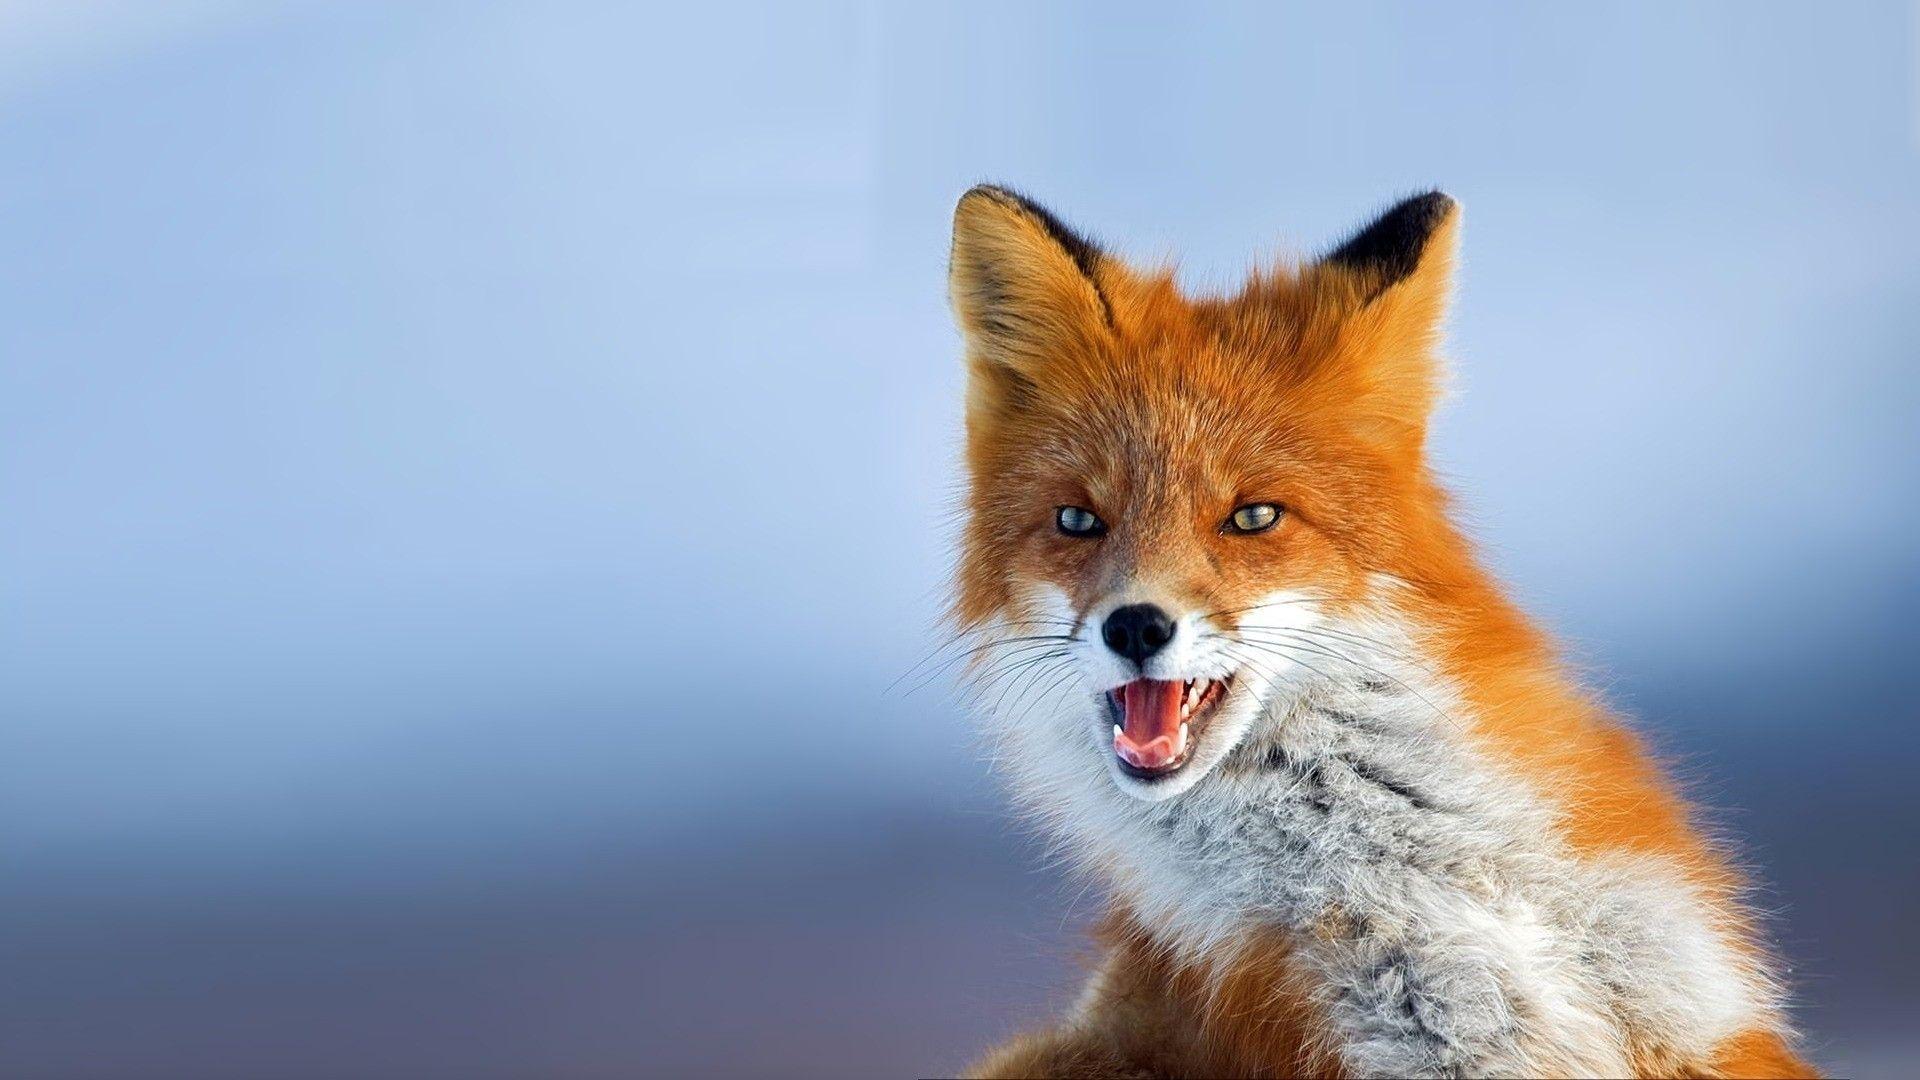 Download Wallpaper 1920x1080 Fox Muzzle Background Eyes Animal Full Hd 1080p Hd Background Pet Fox Animals Beautiful Animal Wallpaper